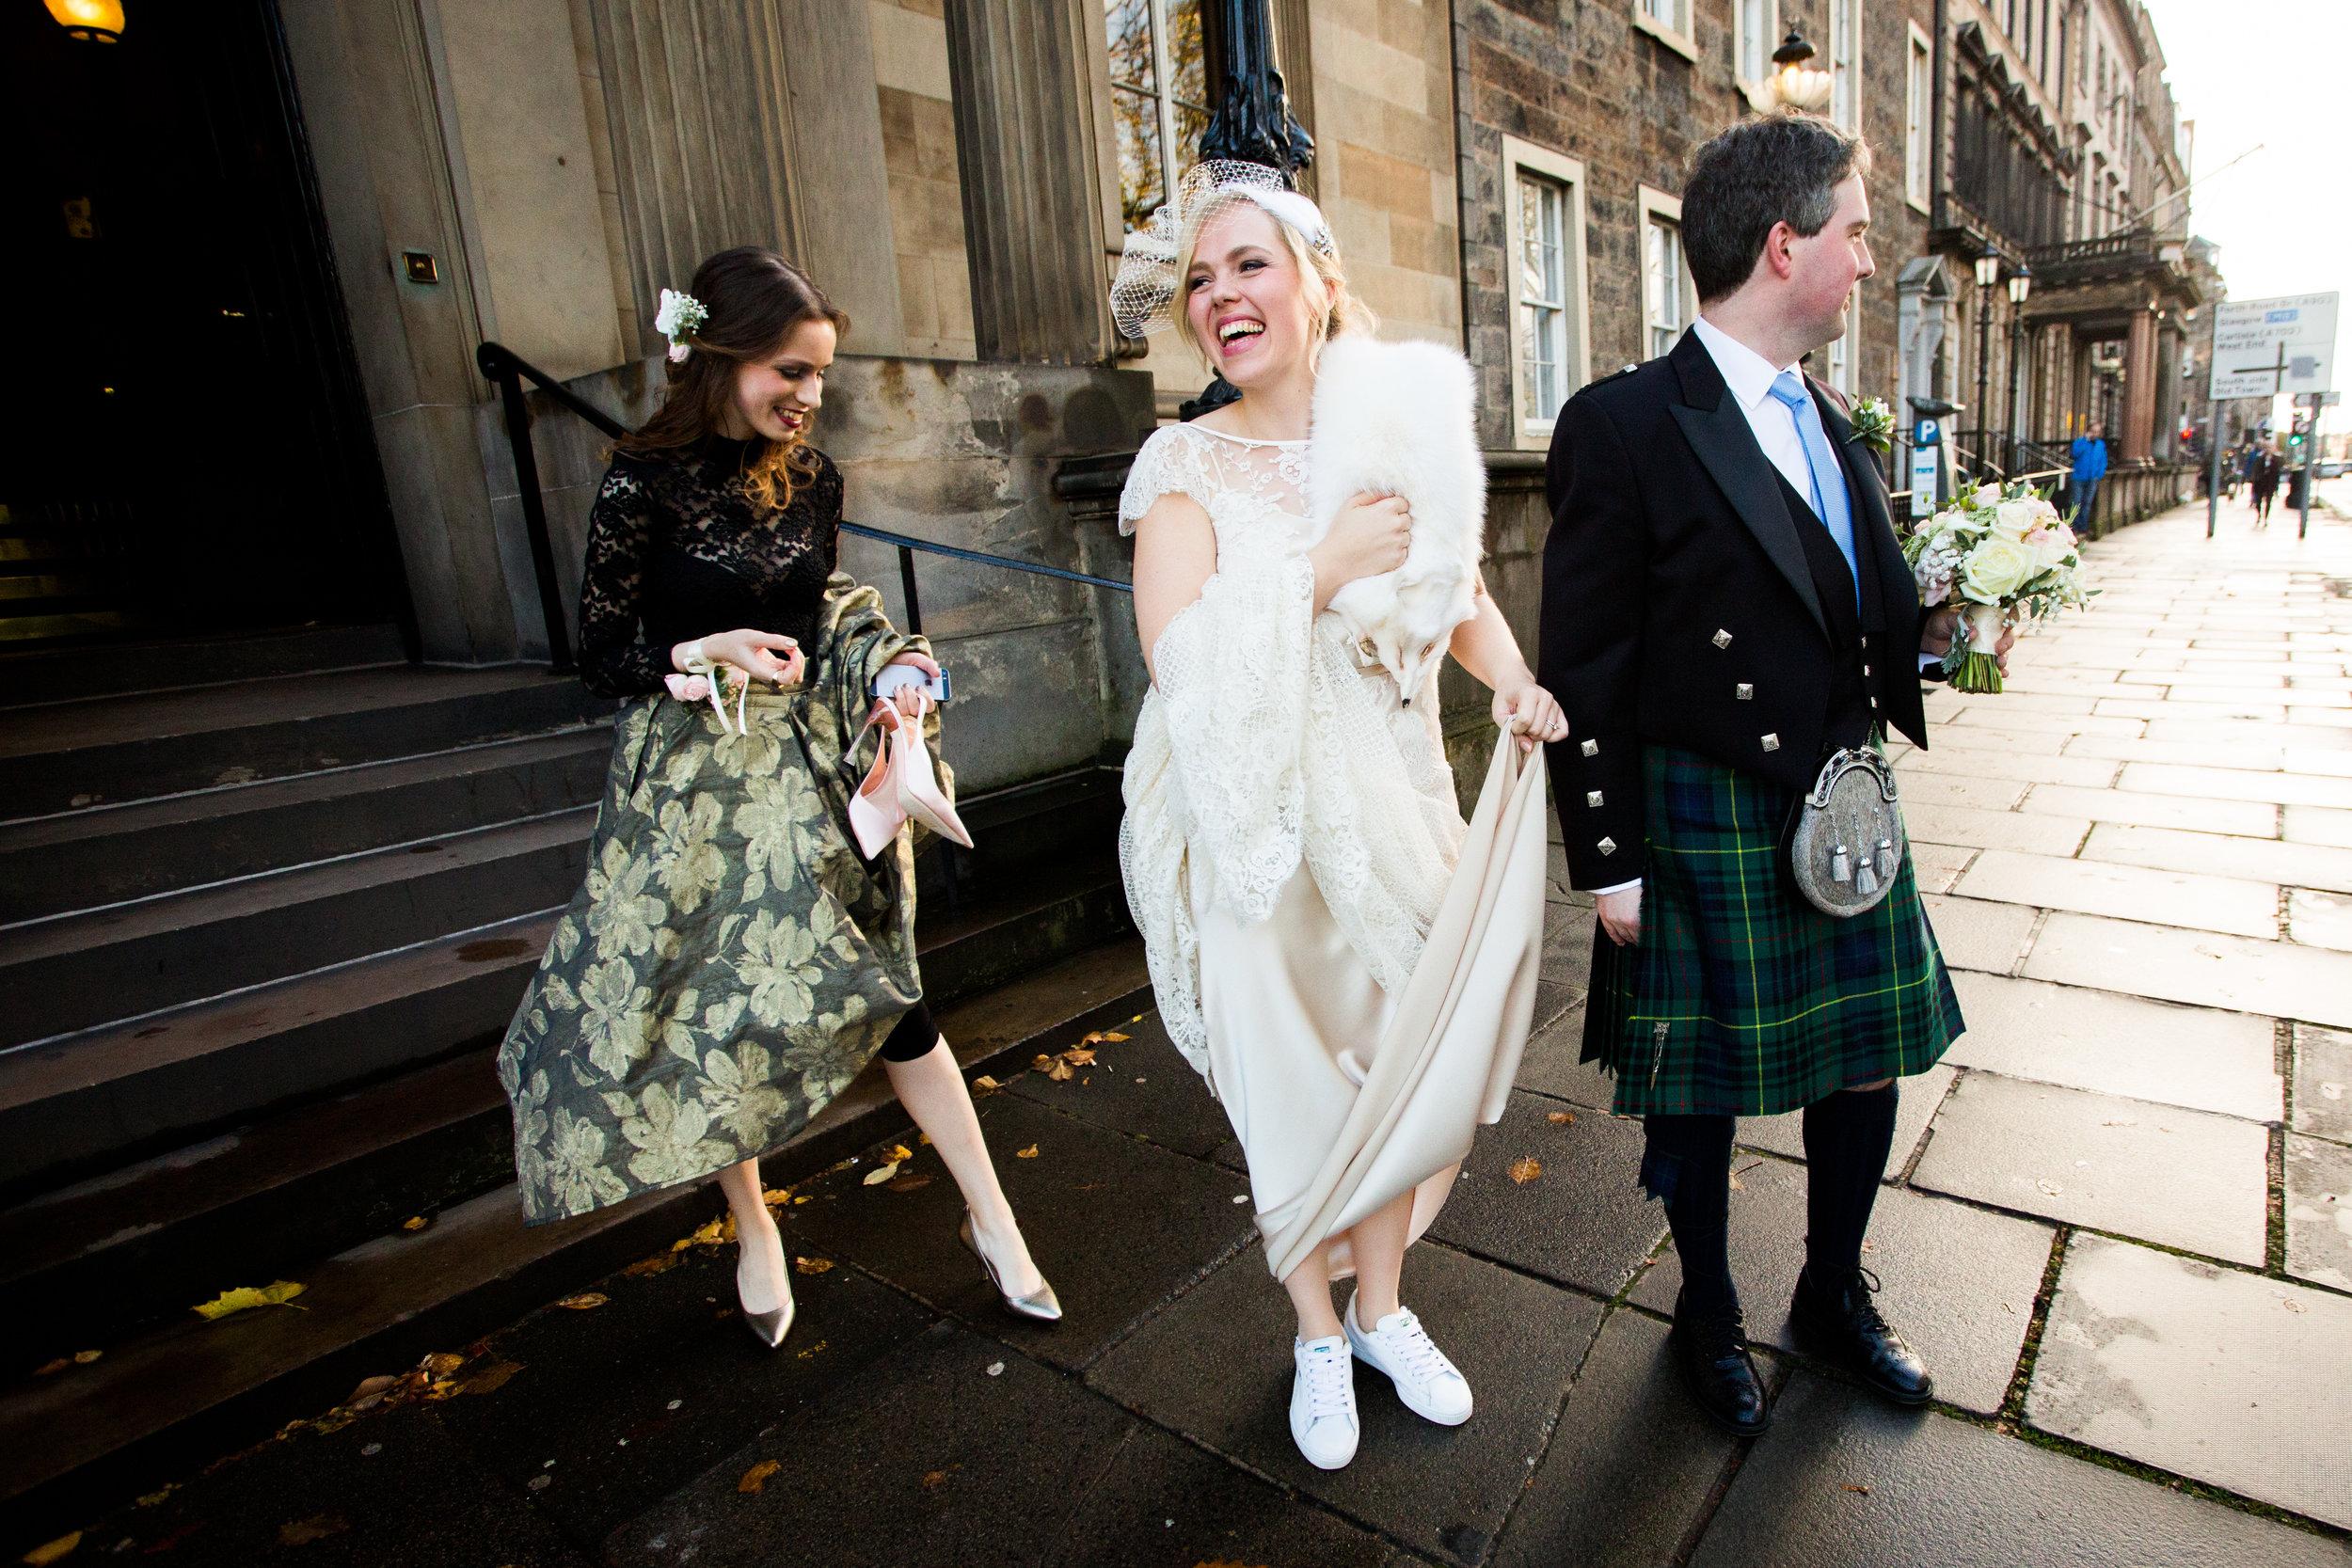 Gorgeous bride Terese wears a wedding dress by Halfpenny London